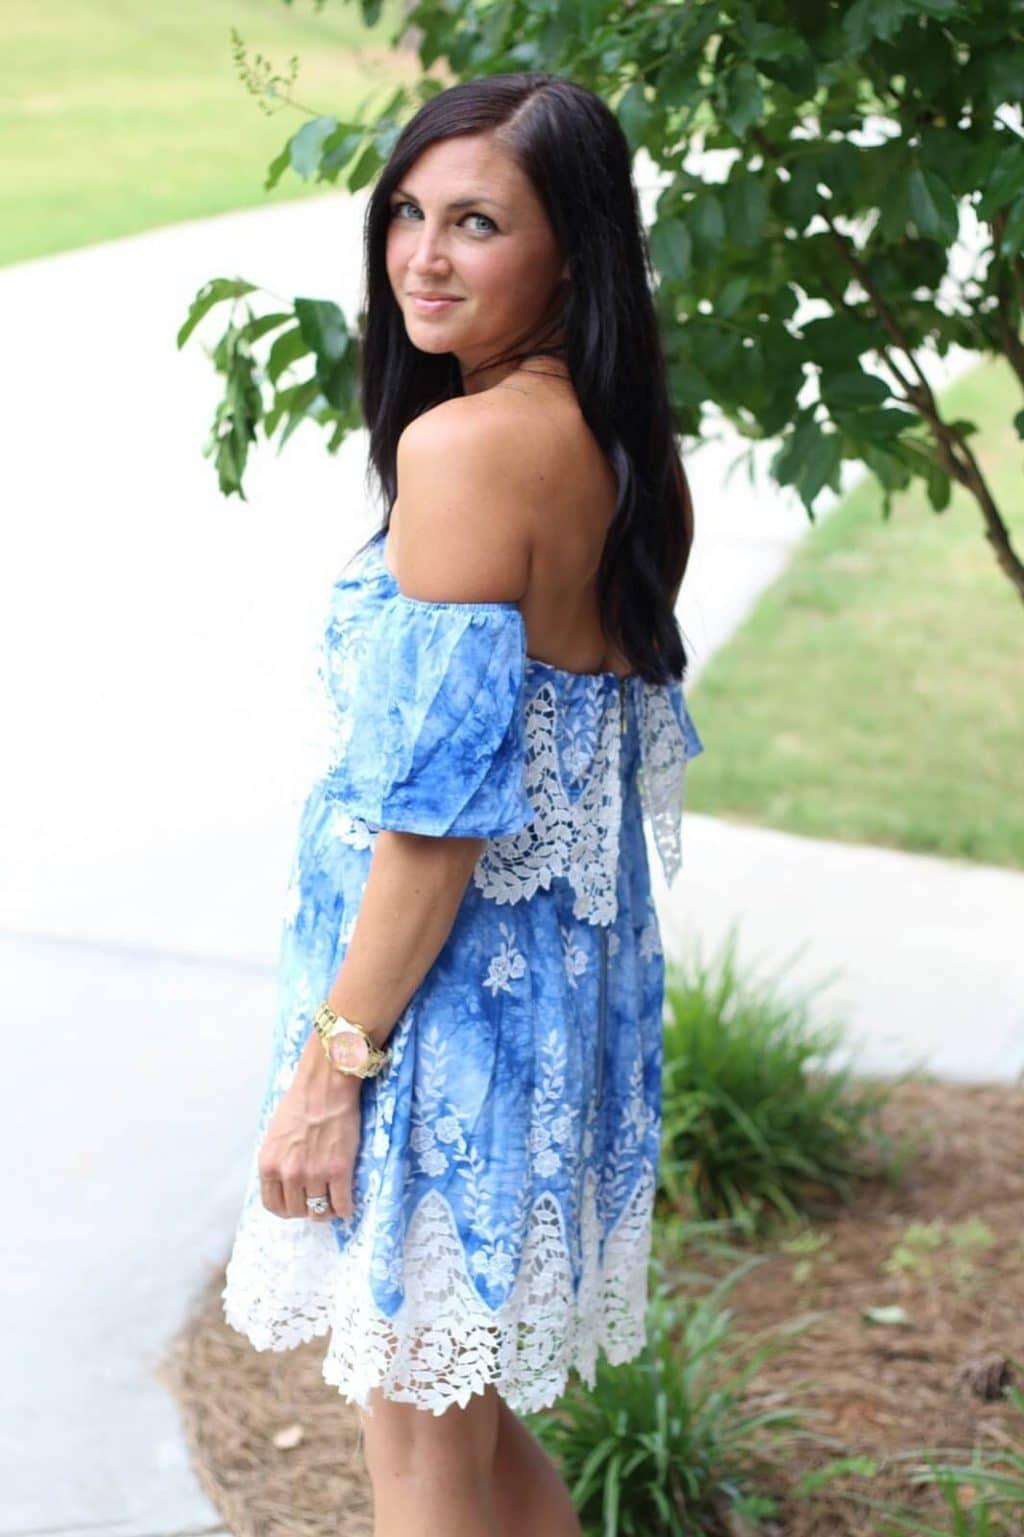 Blue Crochet off shoulder dress, Amazon Prime clothing